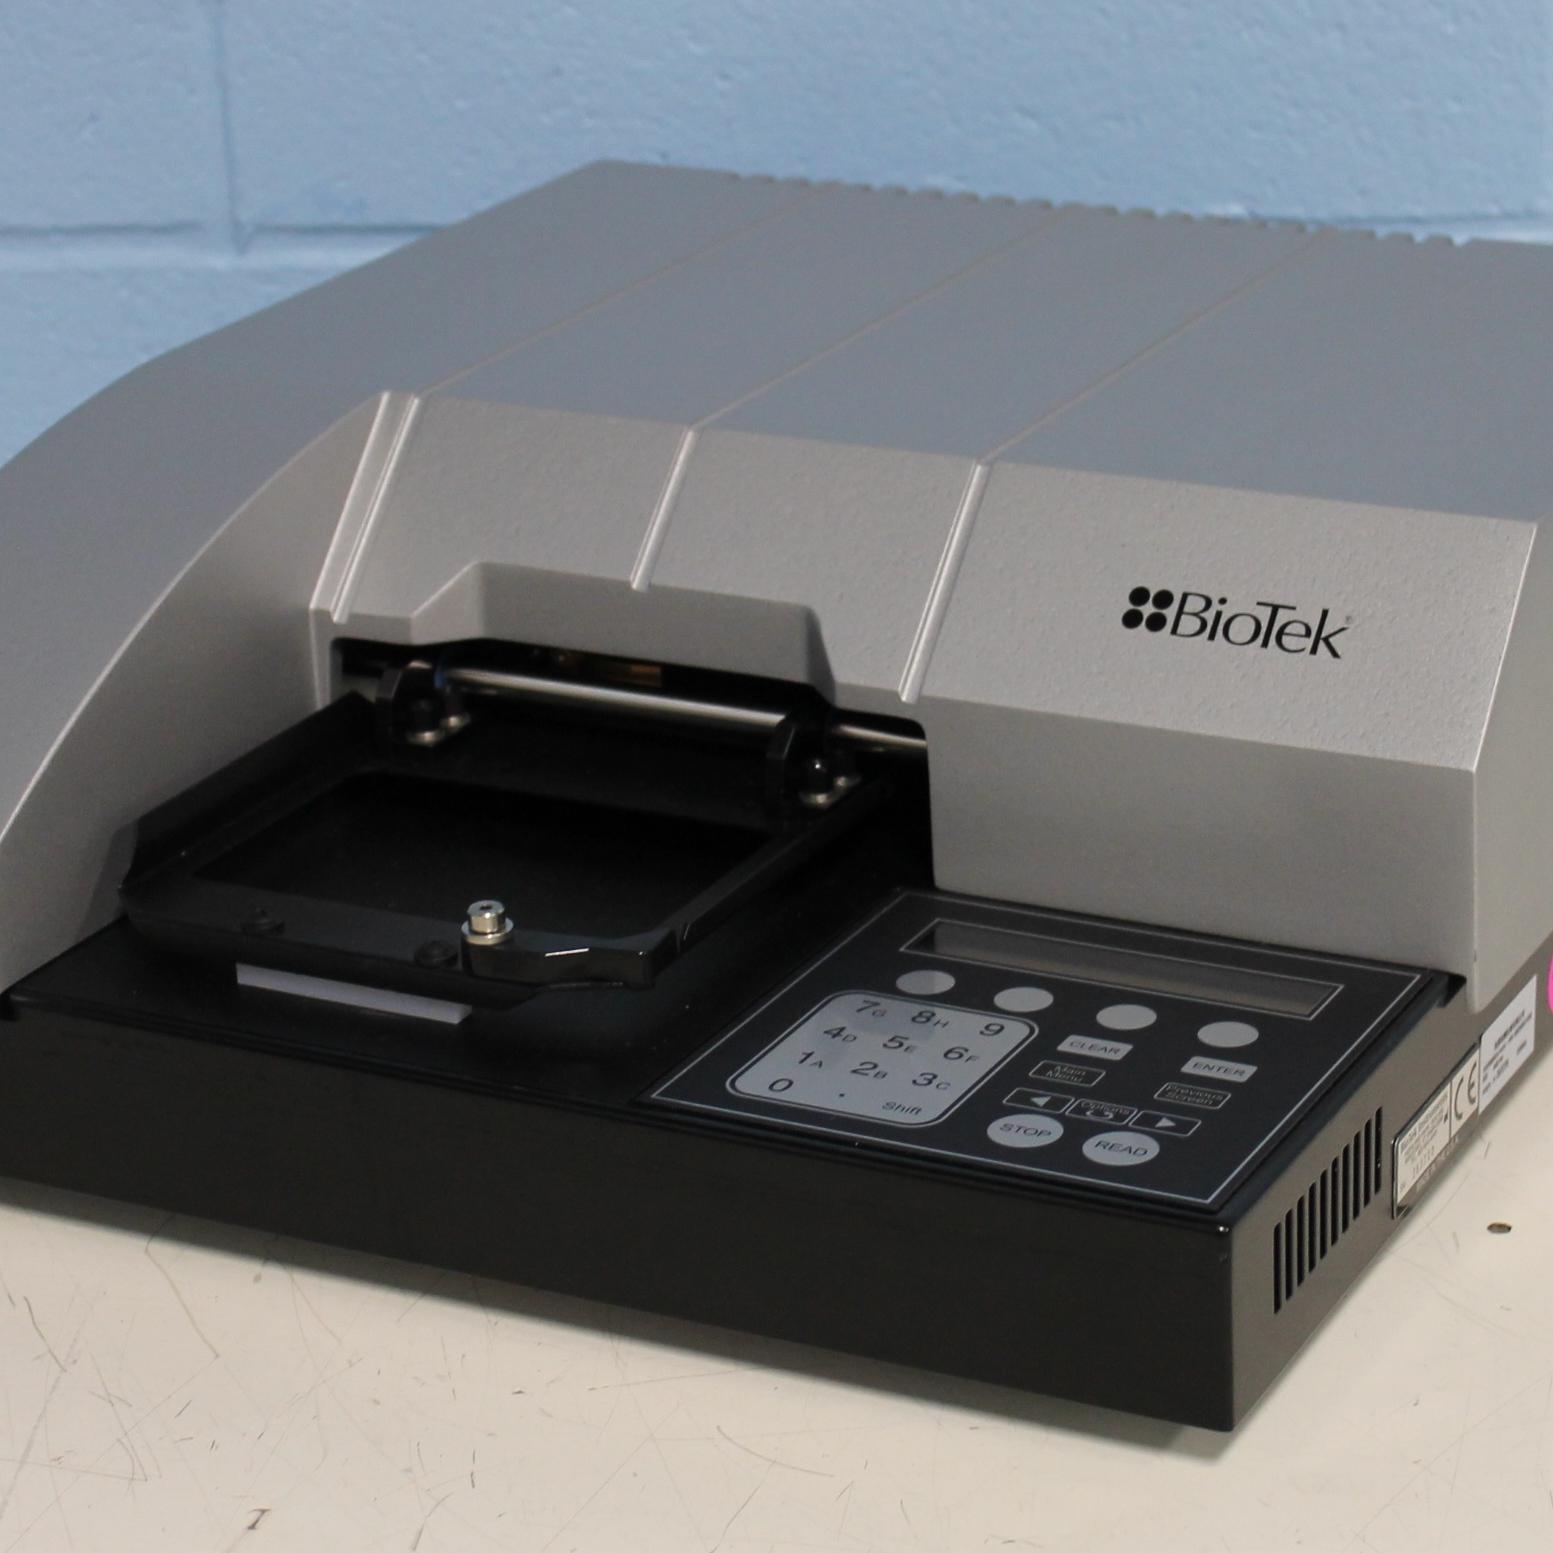 BioTek ELx800 Universal Microplate Reader Image